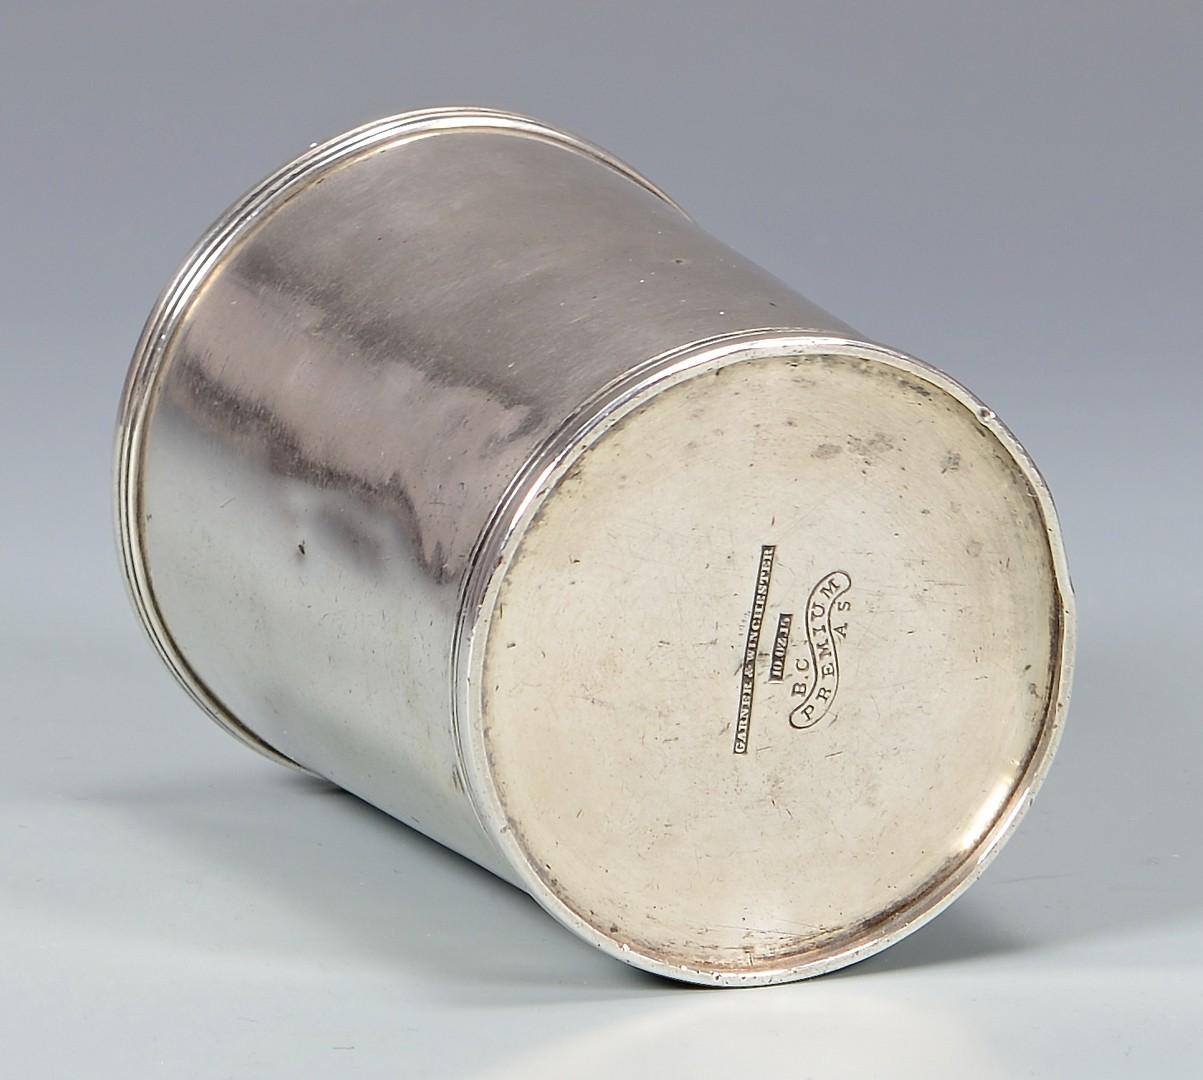 Lot 151: KY Coin Silver Agricultural Premium, Garner & Winc